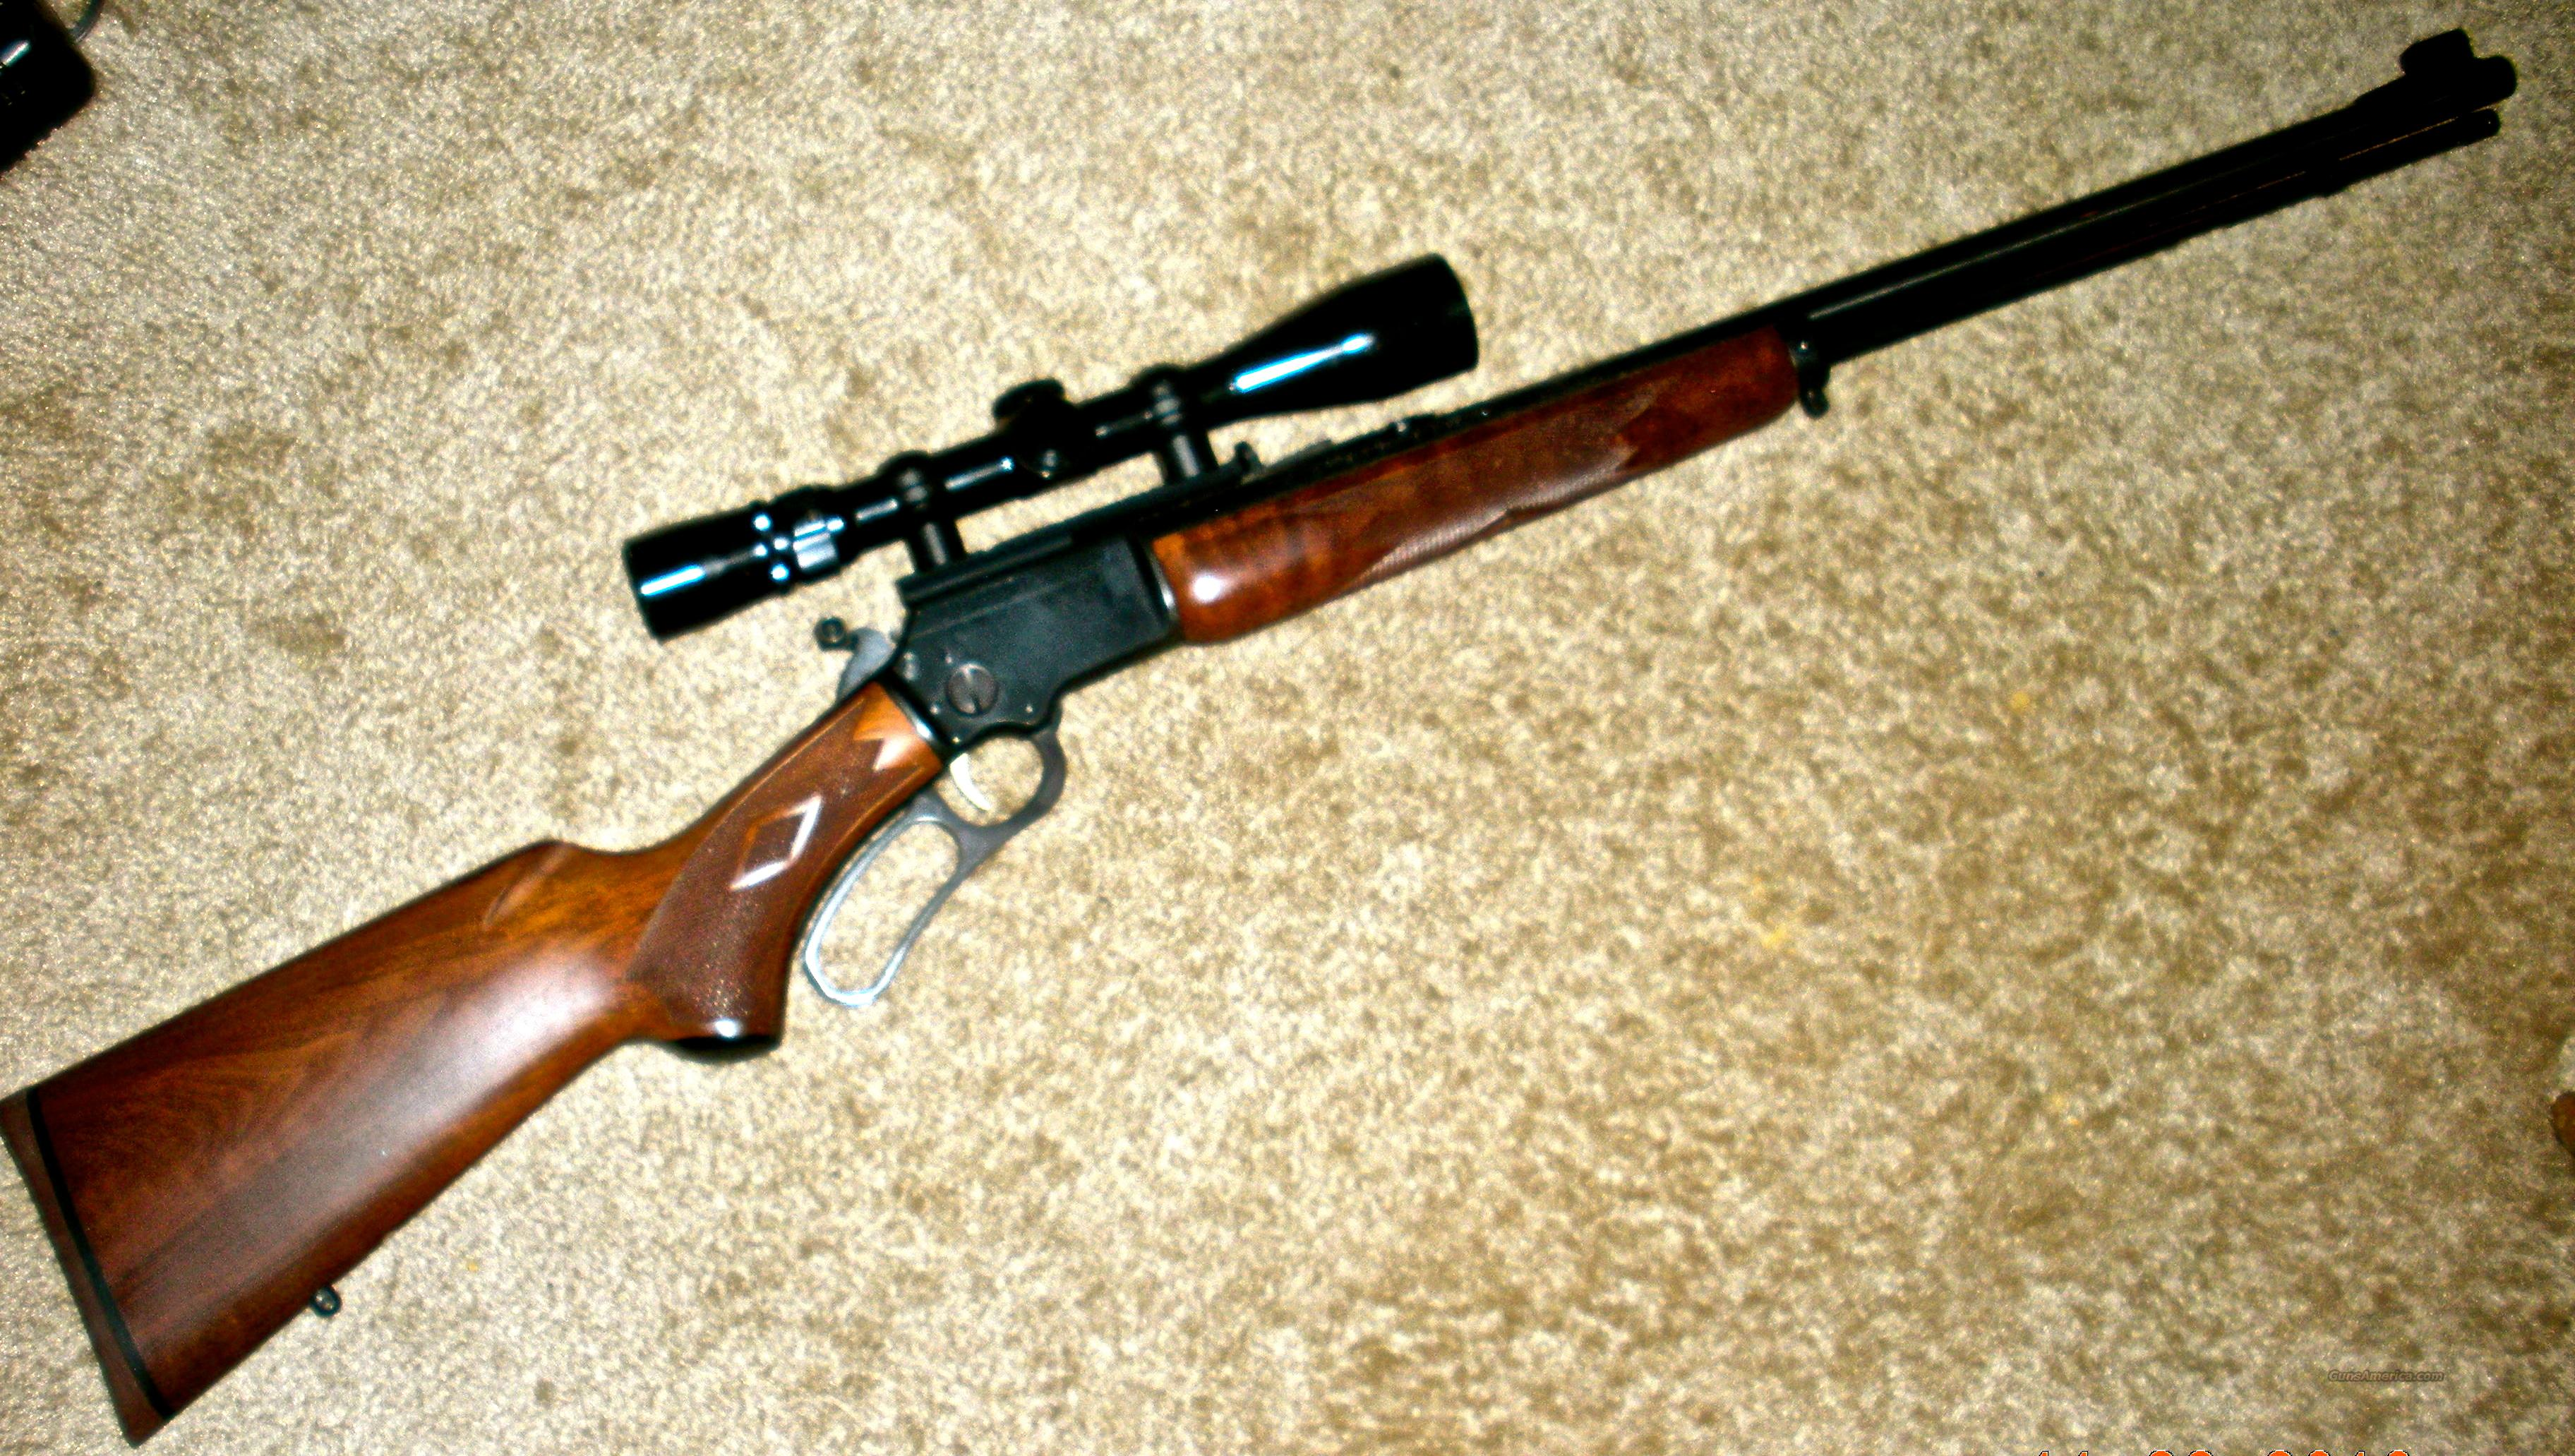 Marlin model 39A Golden .22 caliber for sale